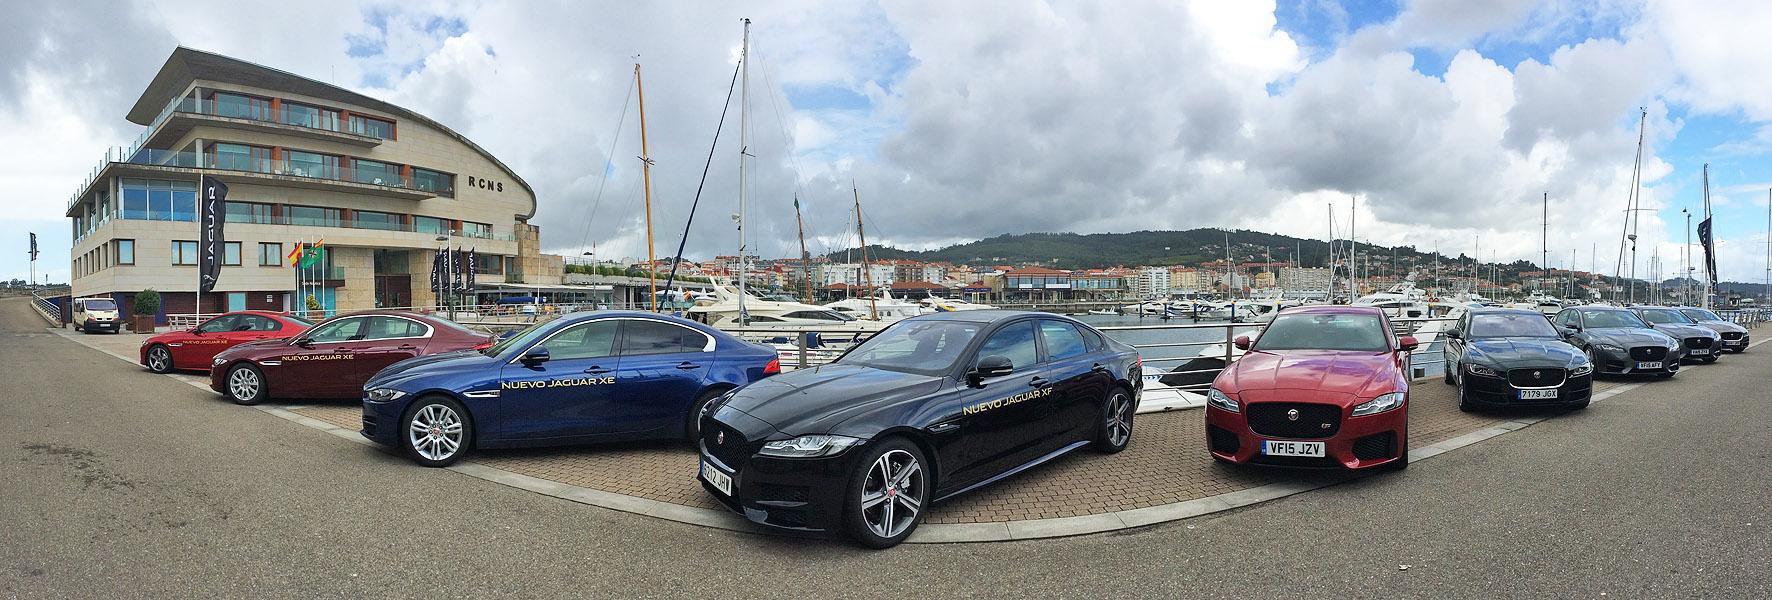 151029_Jaguar2